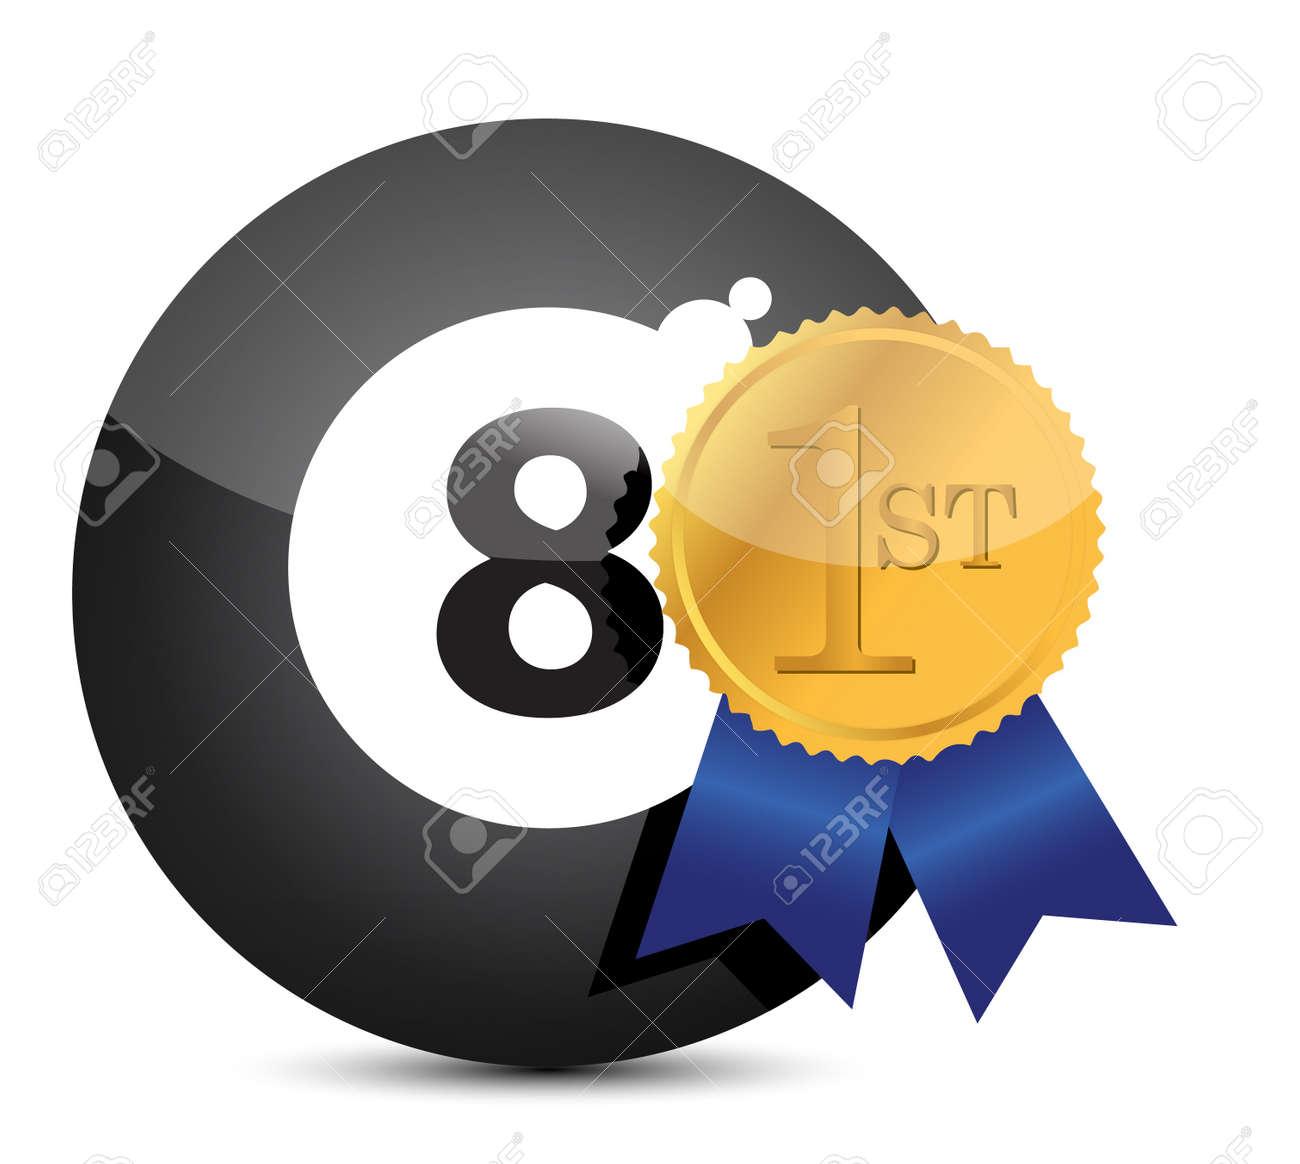 Award winning eight ball illustration design Stock Vector - 13896886